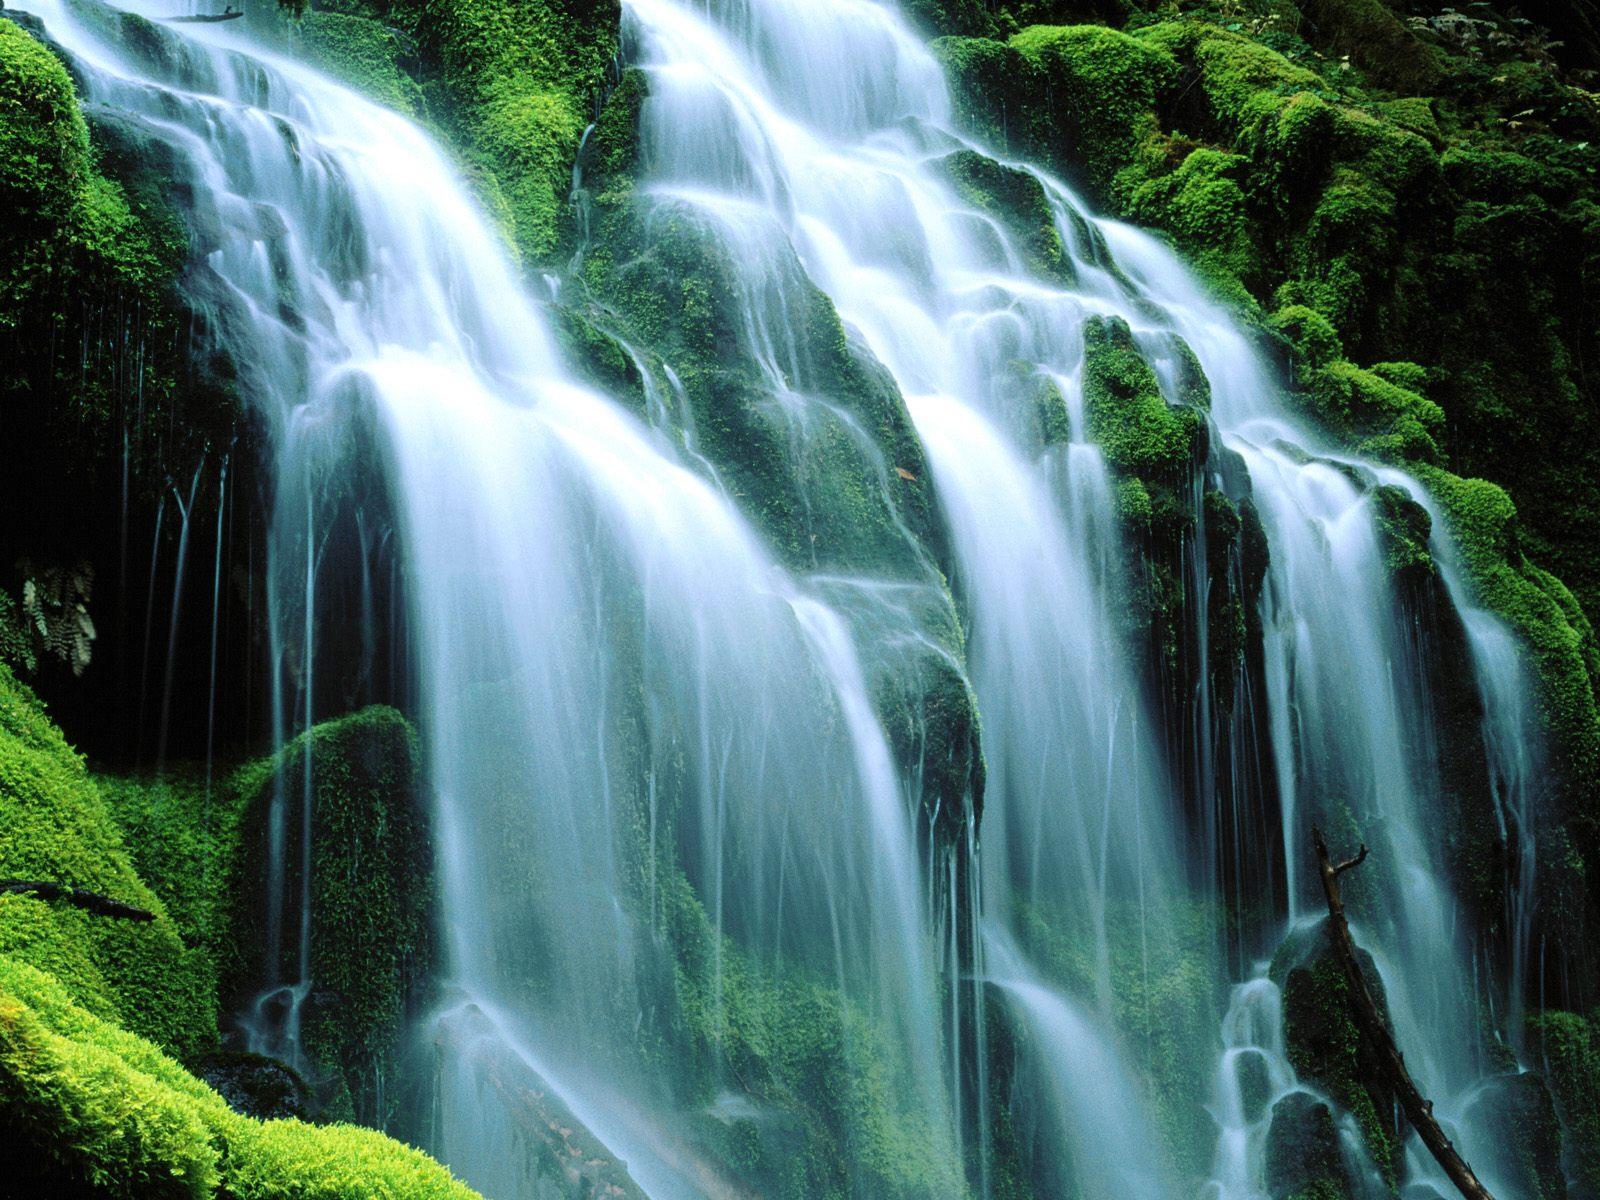 hd widescreen wallpapers new desktop waterfall wallpapers